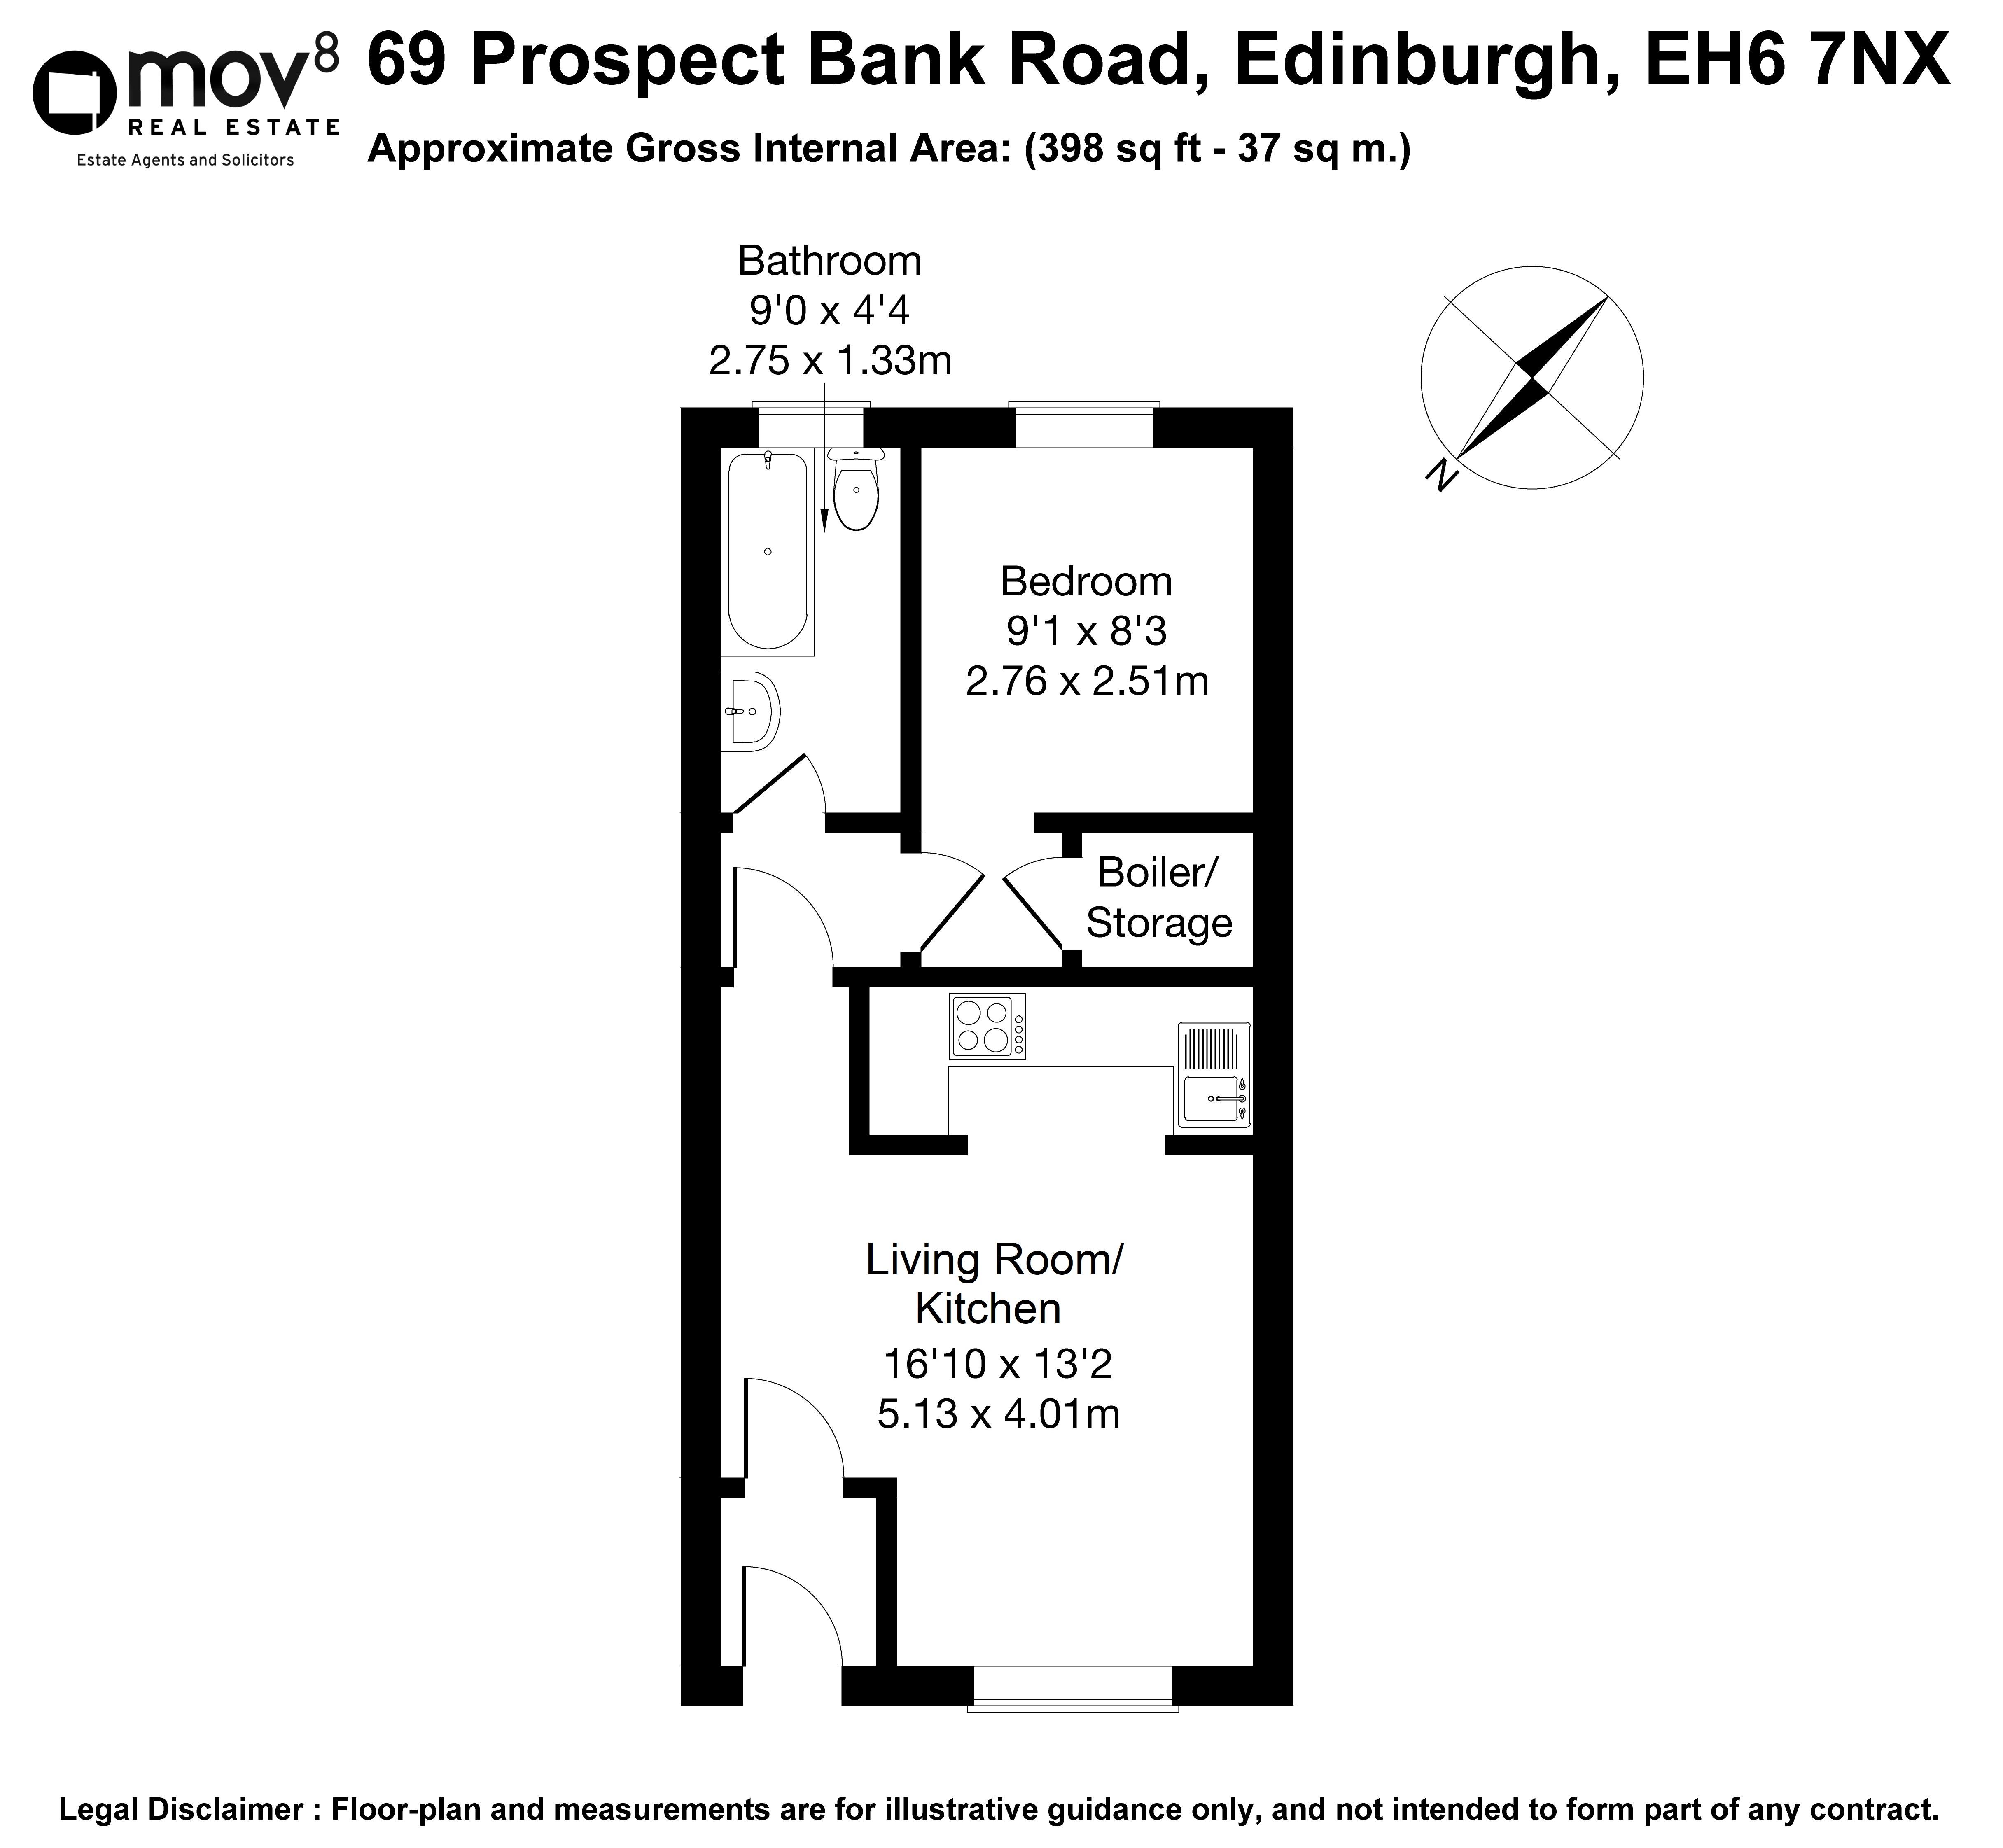 Floorplan 1 of 69 Prospect Bank Road, Leith Links, Edinburgh, EH6 7NX